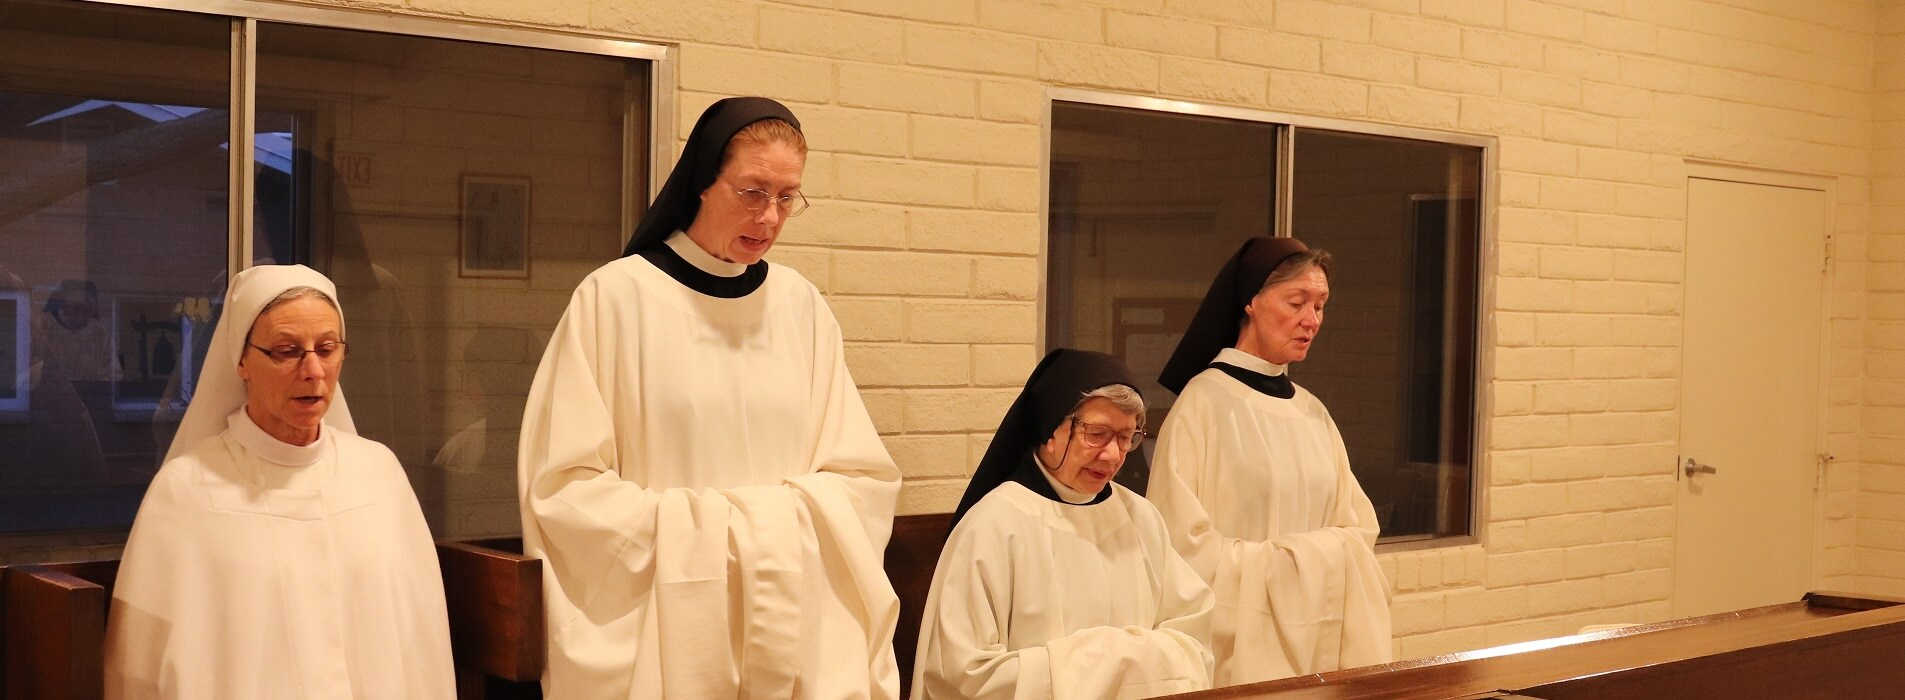 20210118 SantaRitaAbbey choir 1